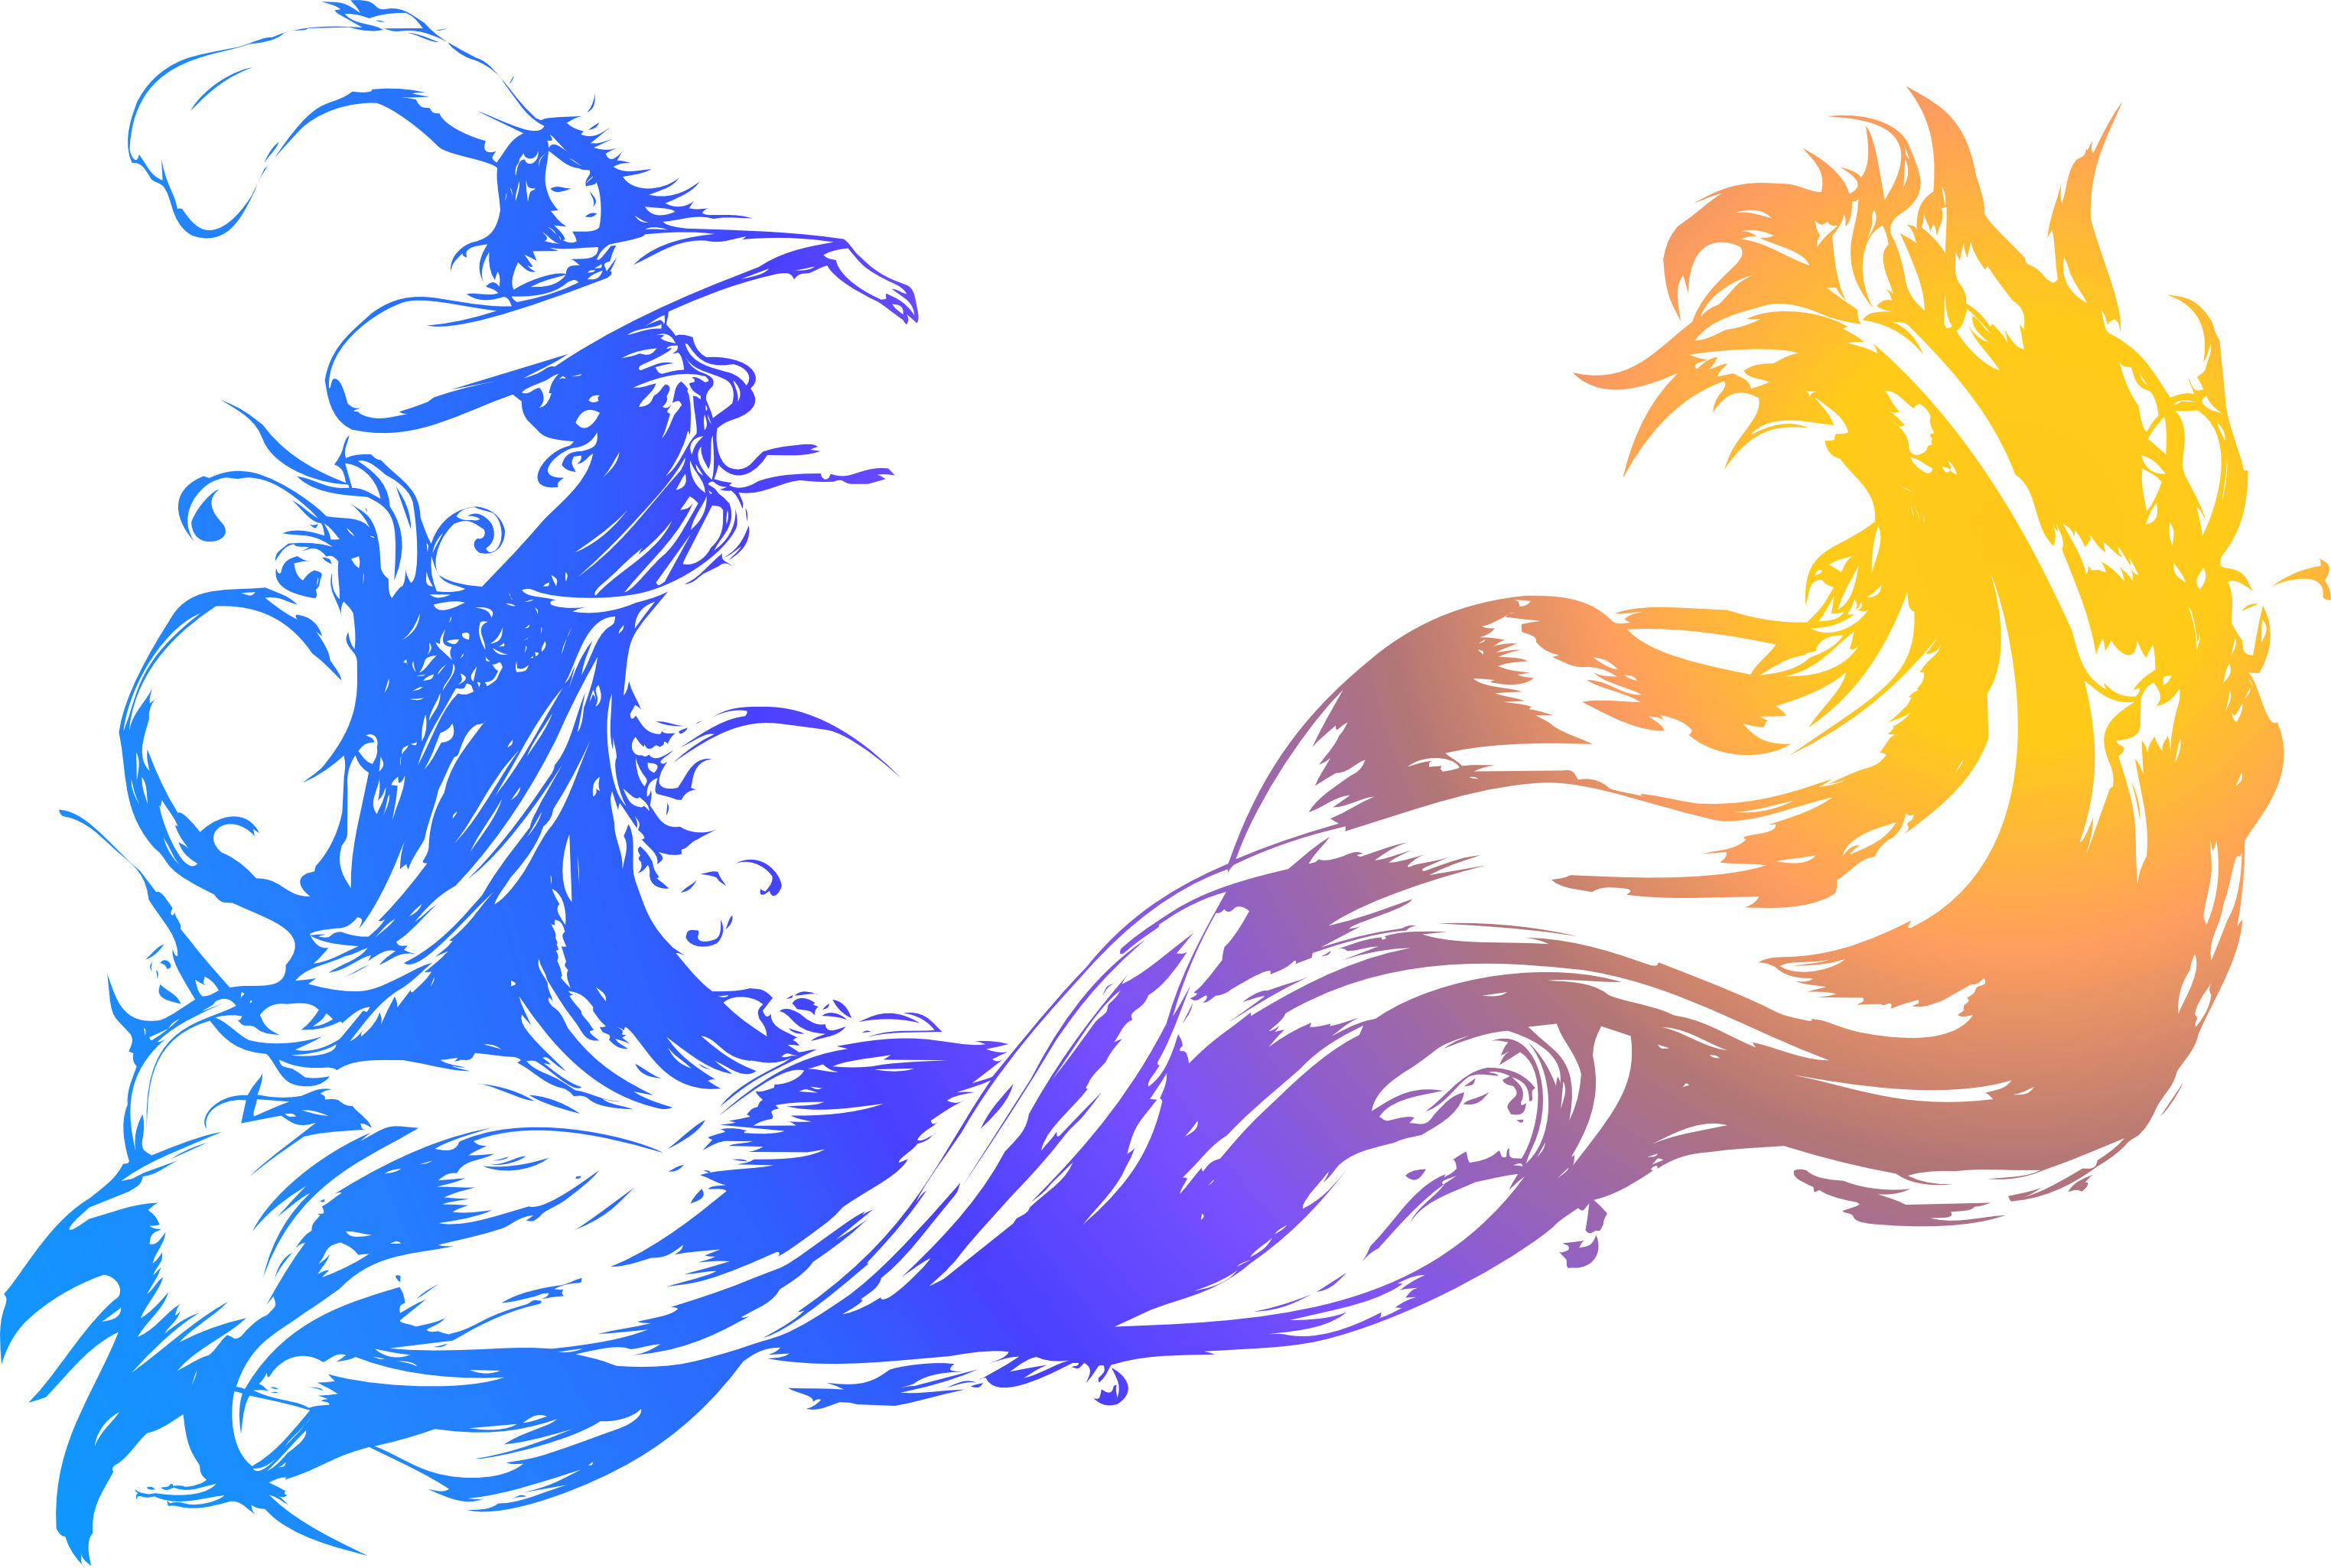 Final fantasy xii logo png - photo#6